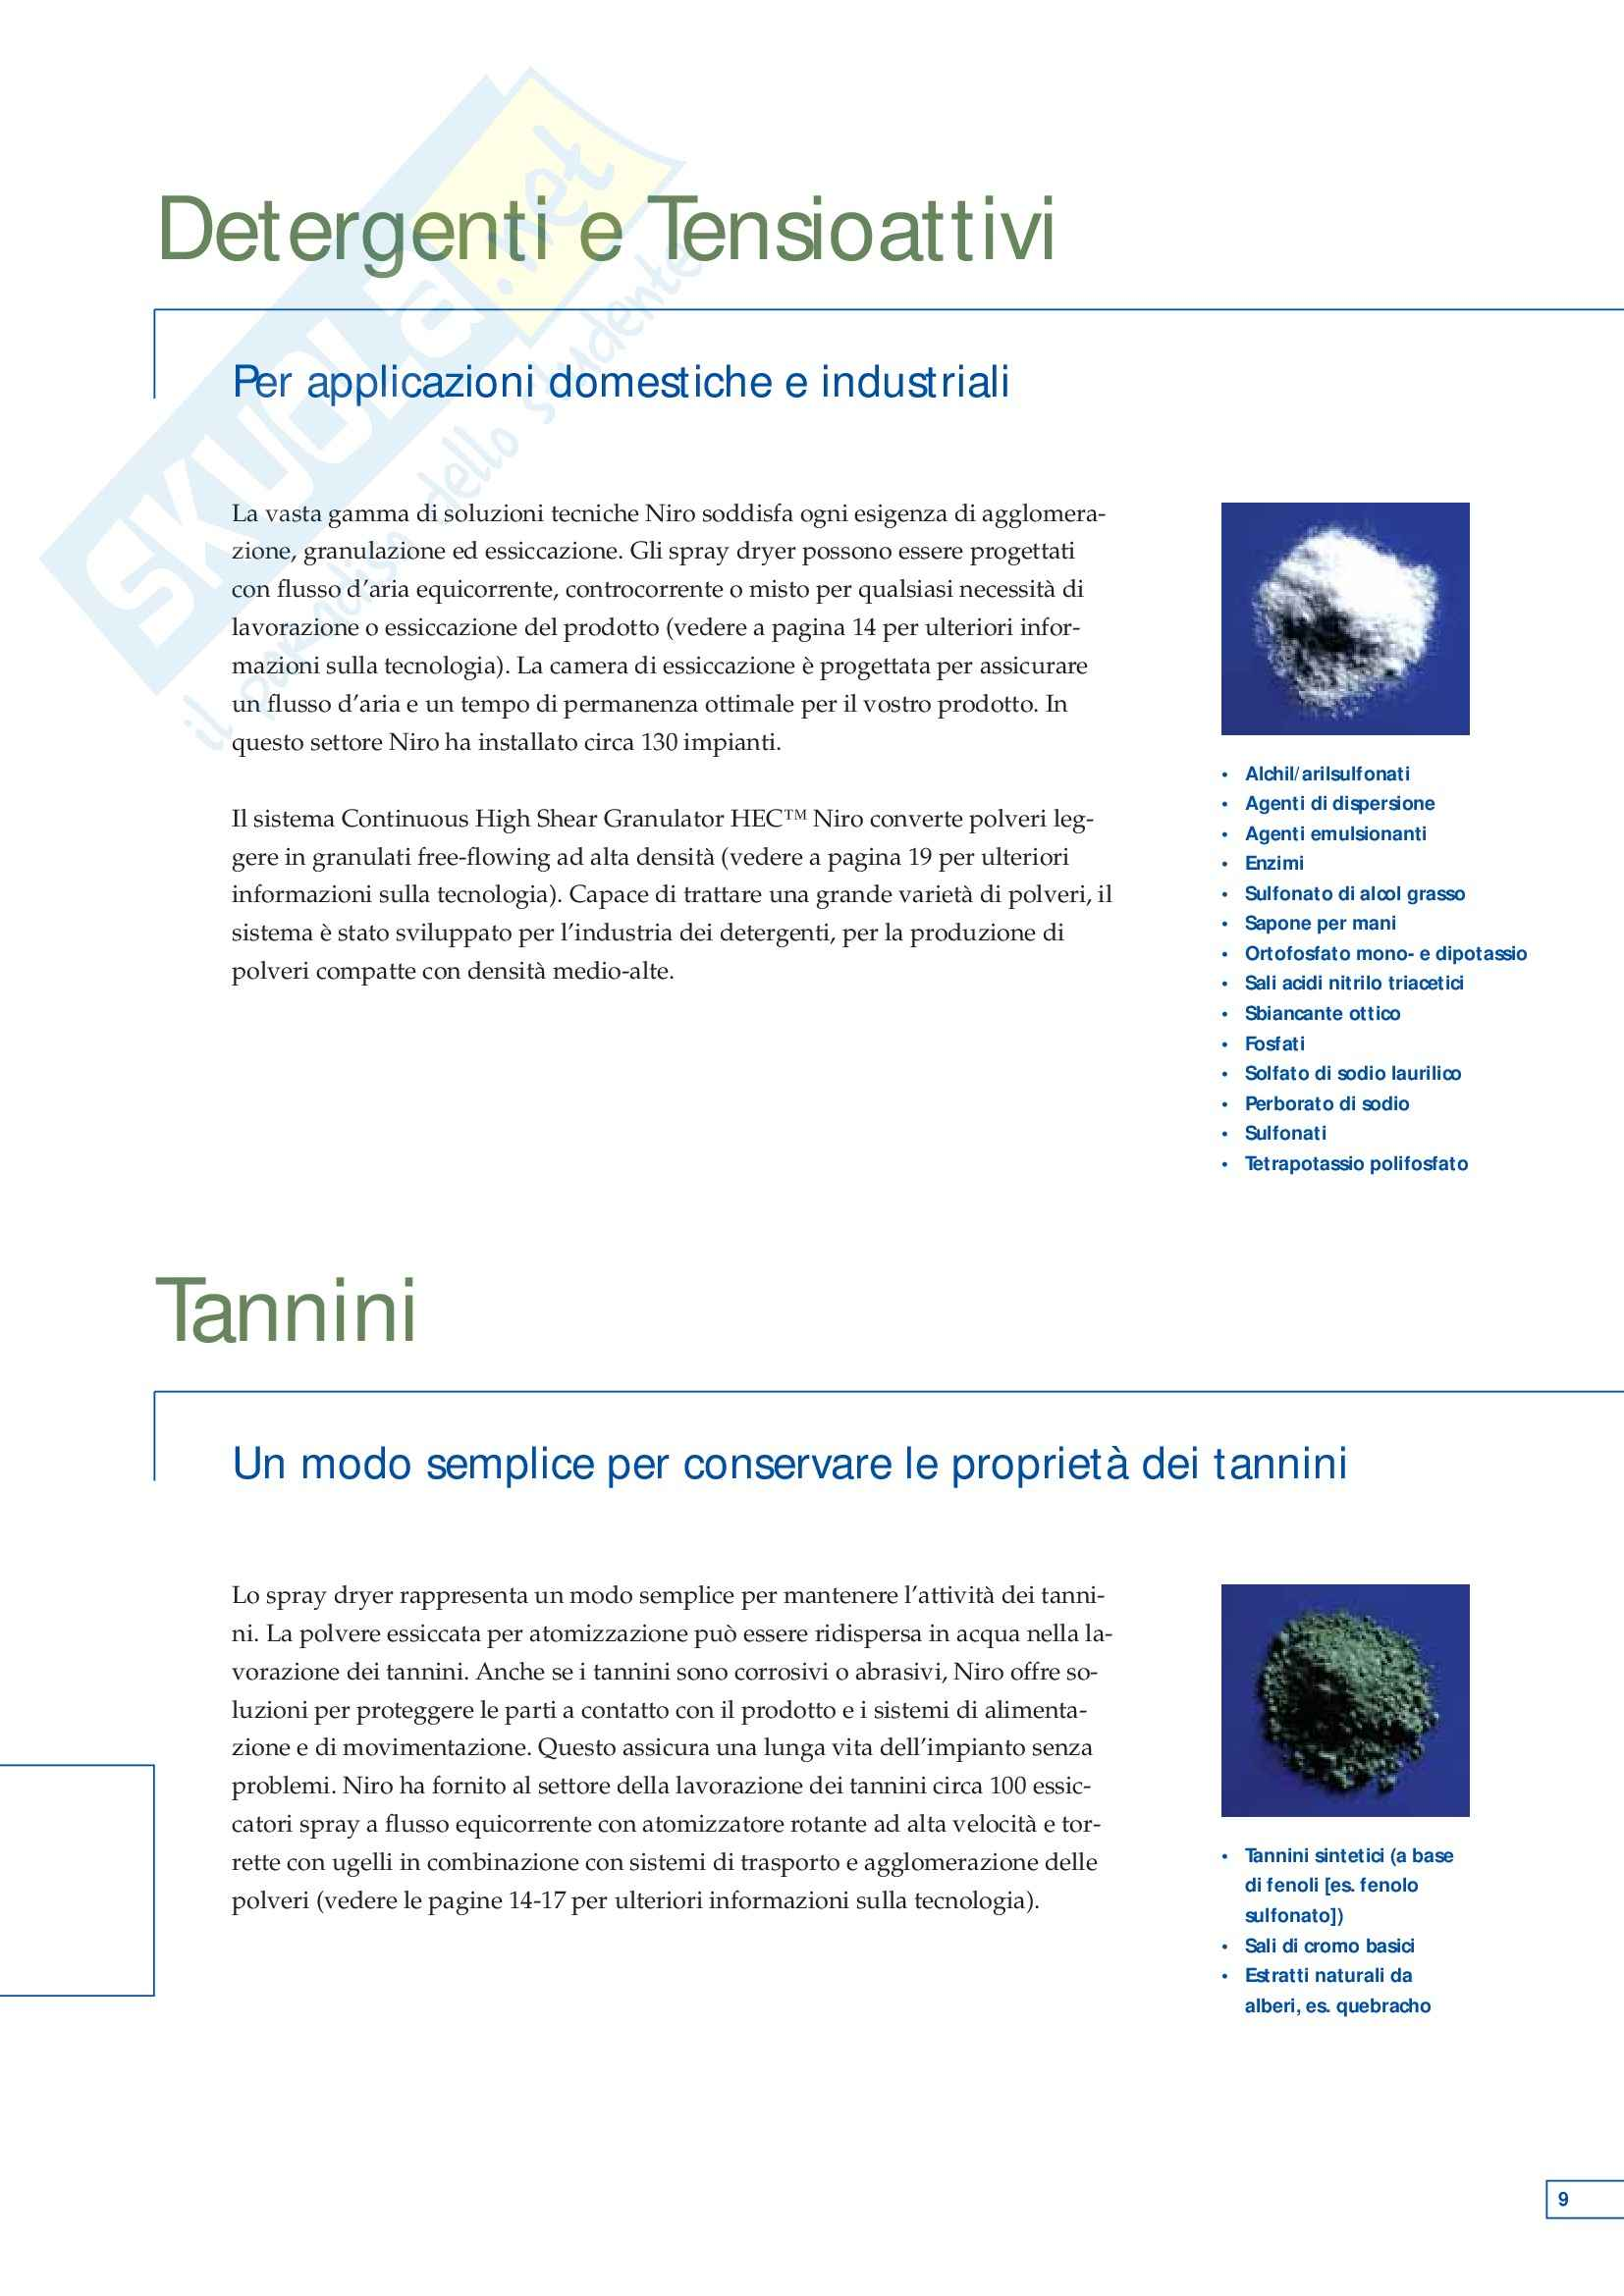 Tecnica farmaceutica - tecnologie di spray drying Pag. 11